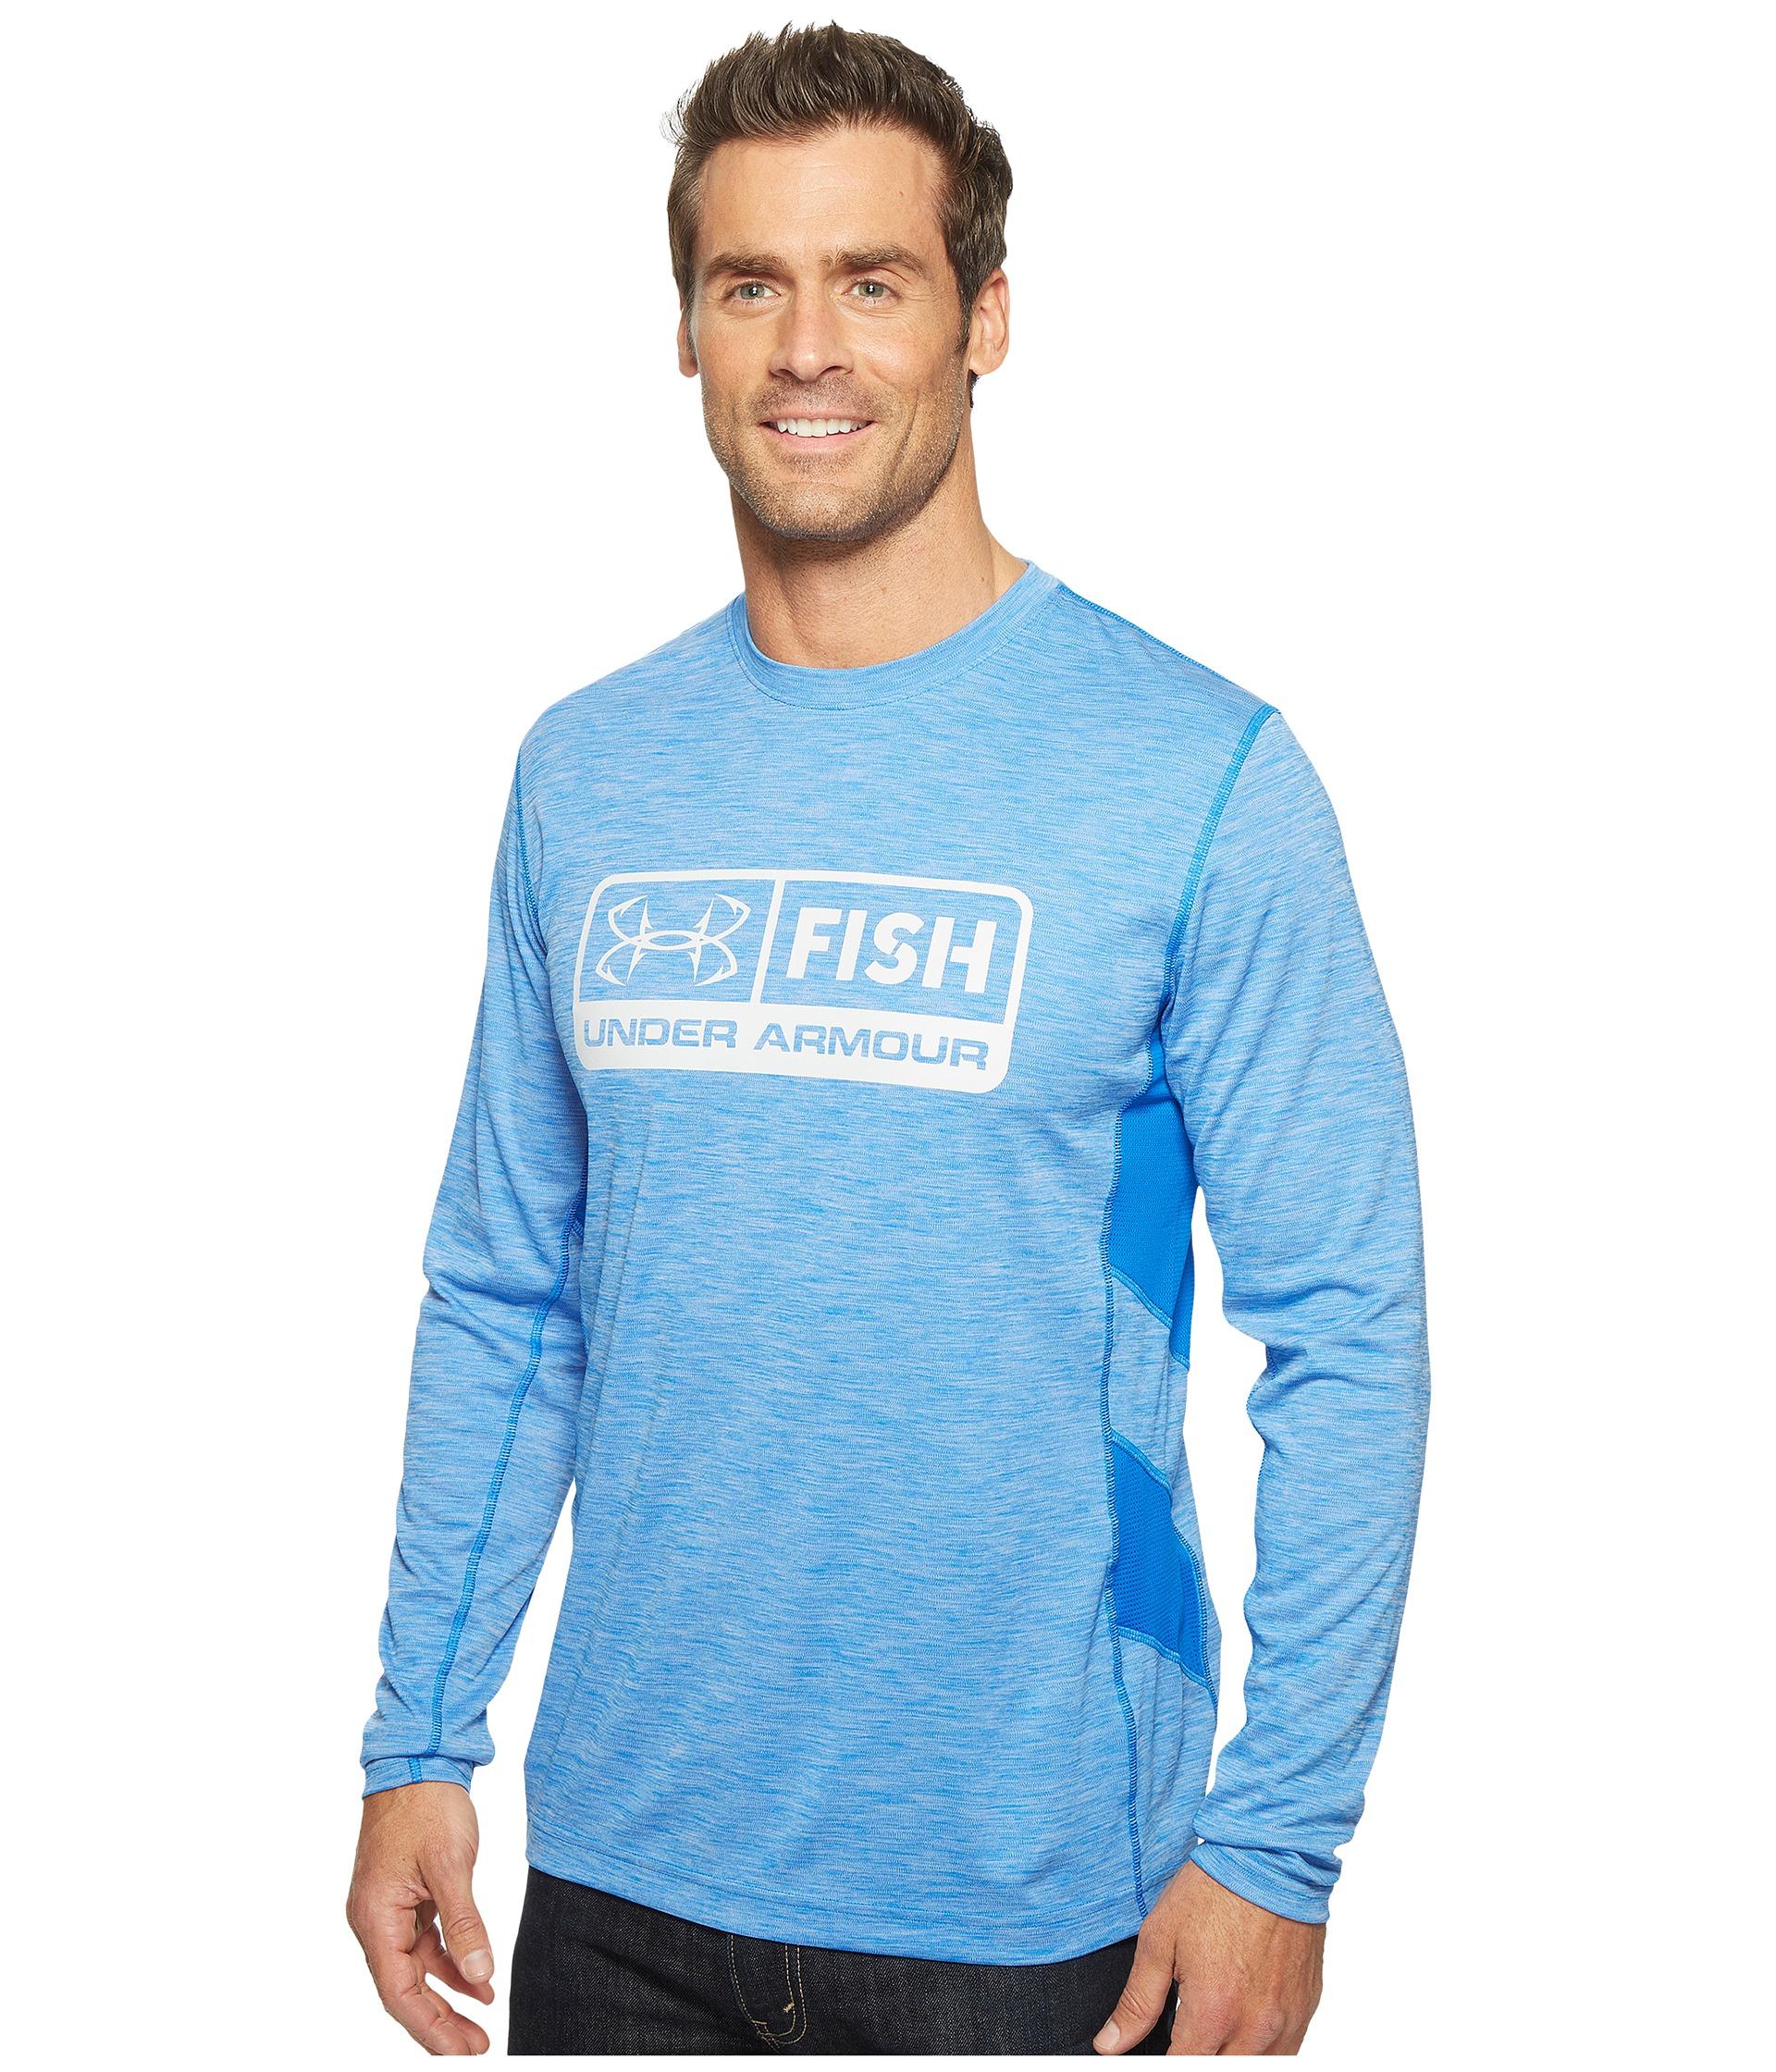 Under armour ua fish hunter tech long sleeve shirt at for Under armour fish hunter shirt